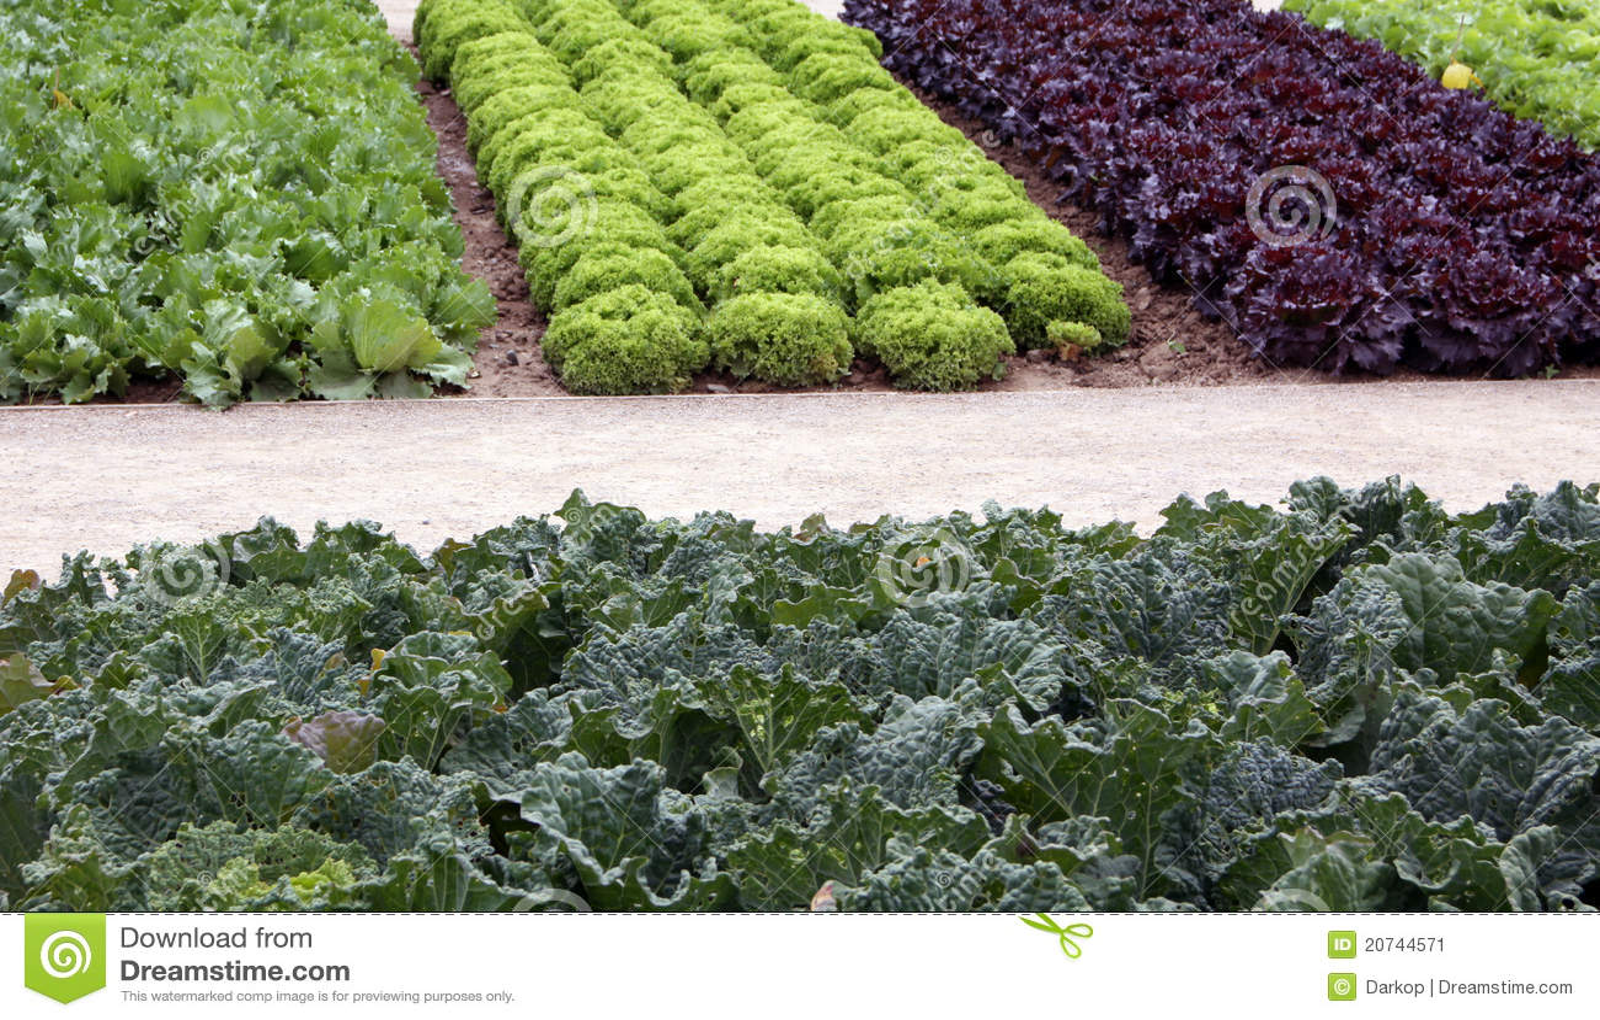 Stock Image Vegetable Garden Beds Salad Cale Image20744571 on Raised Vegetable Garden Design